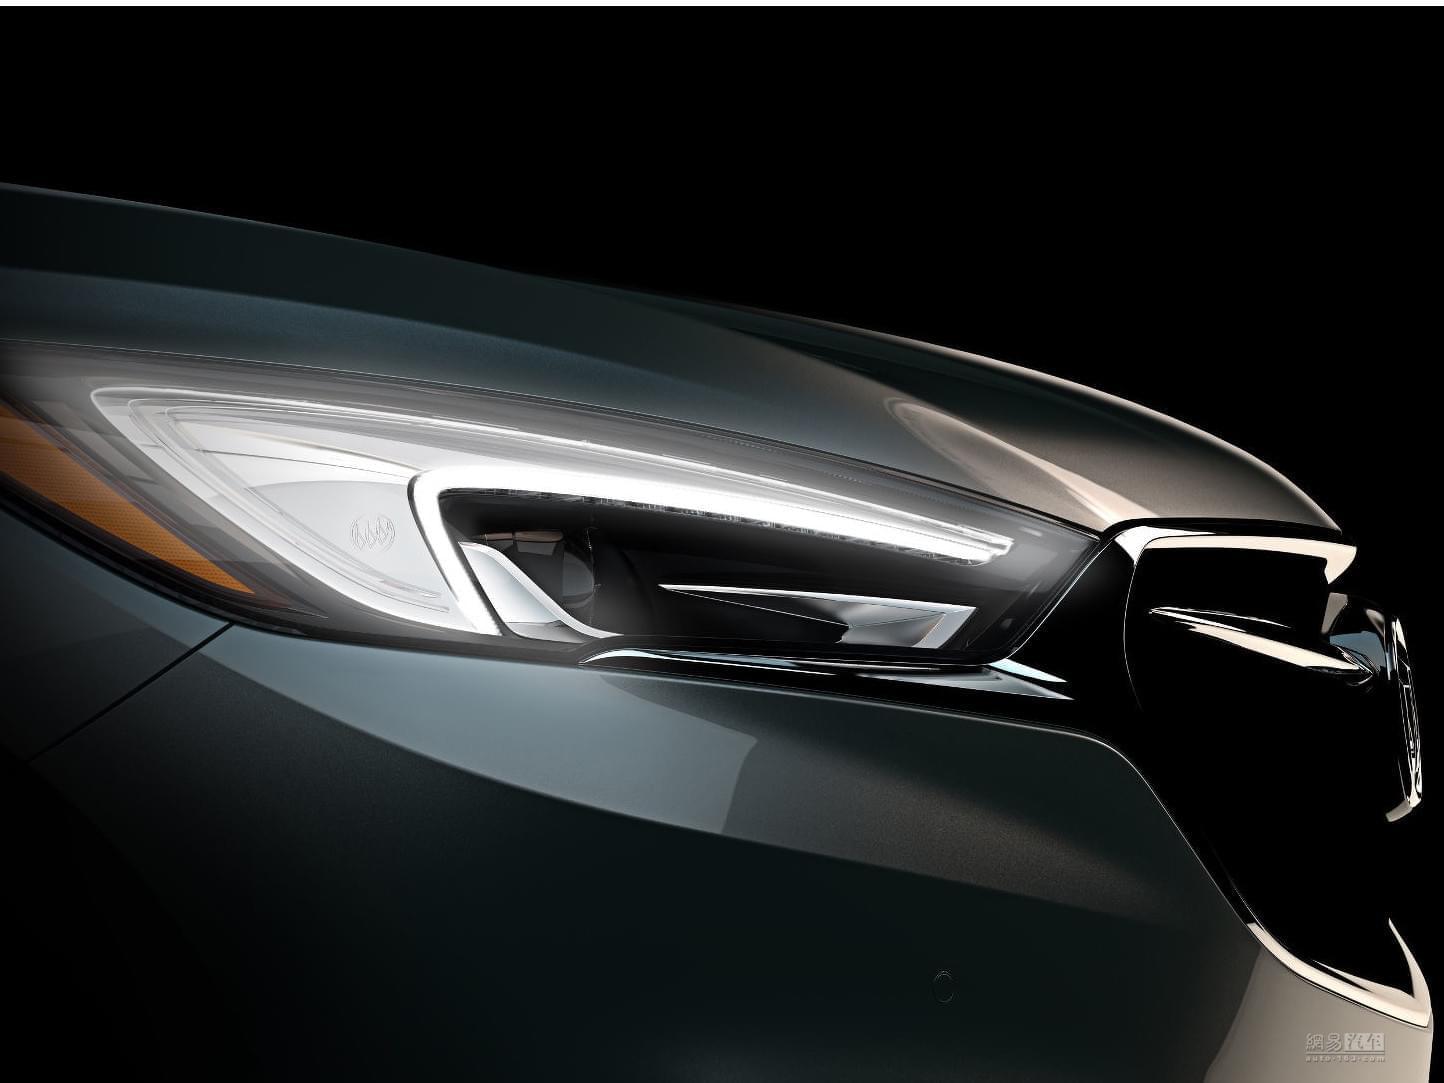 2.0T的全尺寸SUV? 全新昂科雷预览图发布